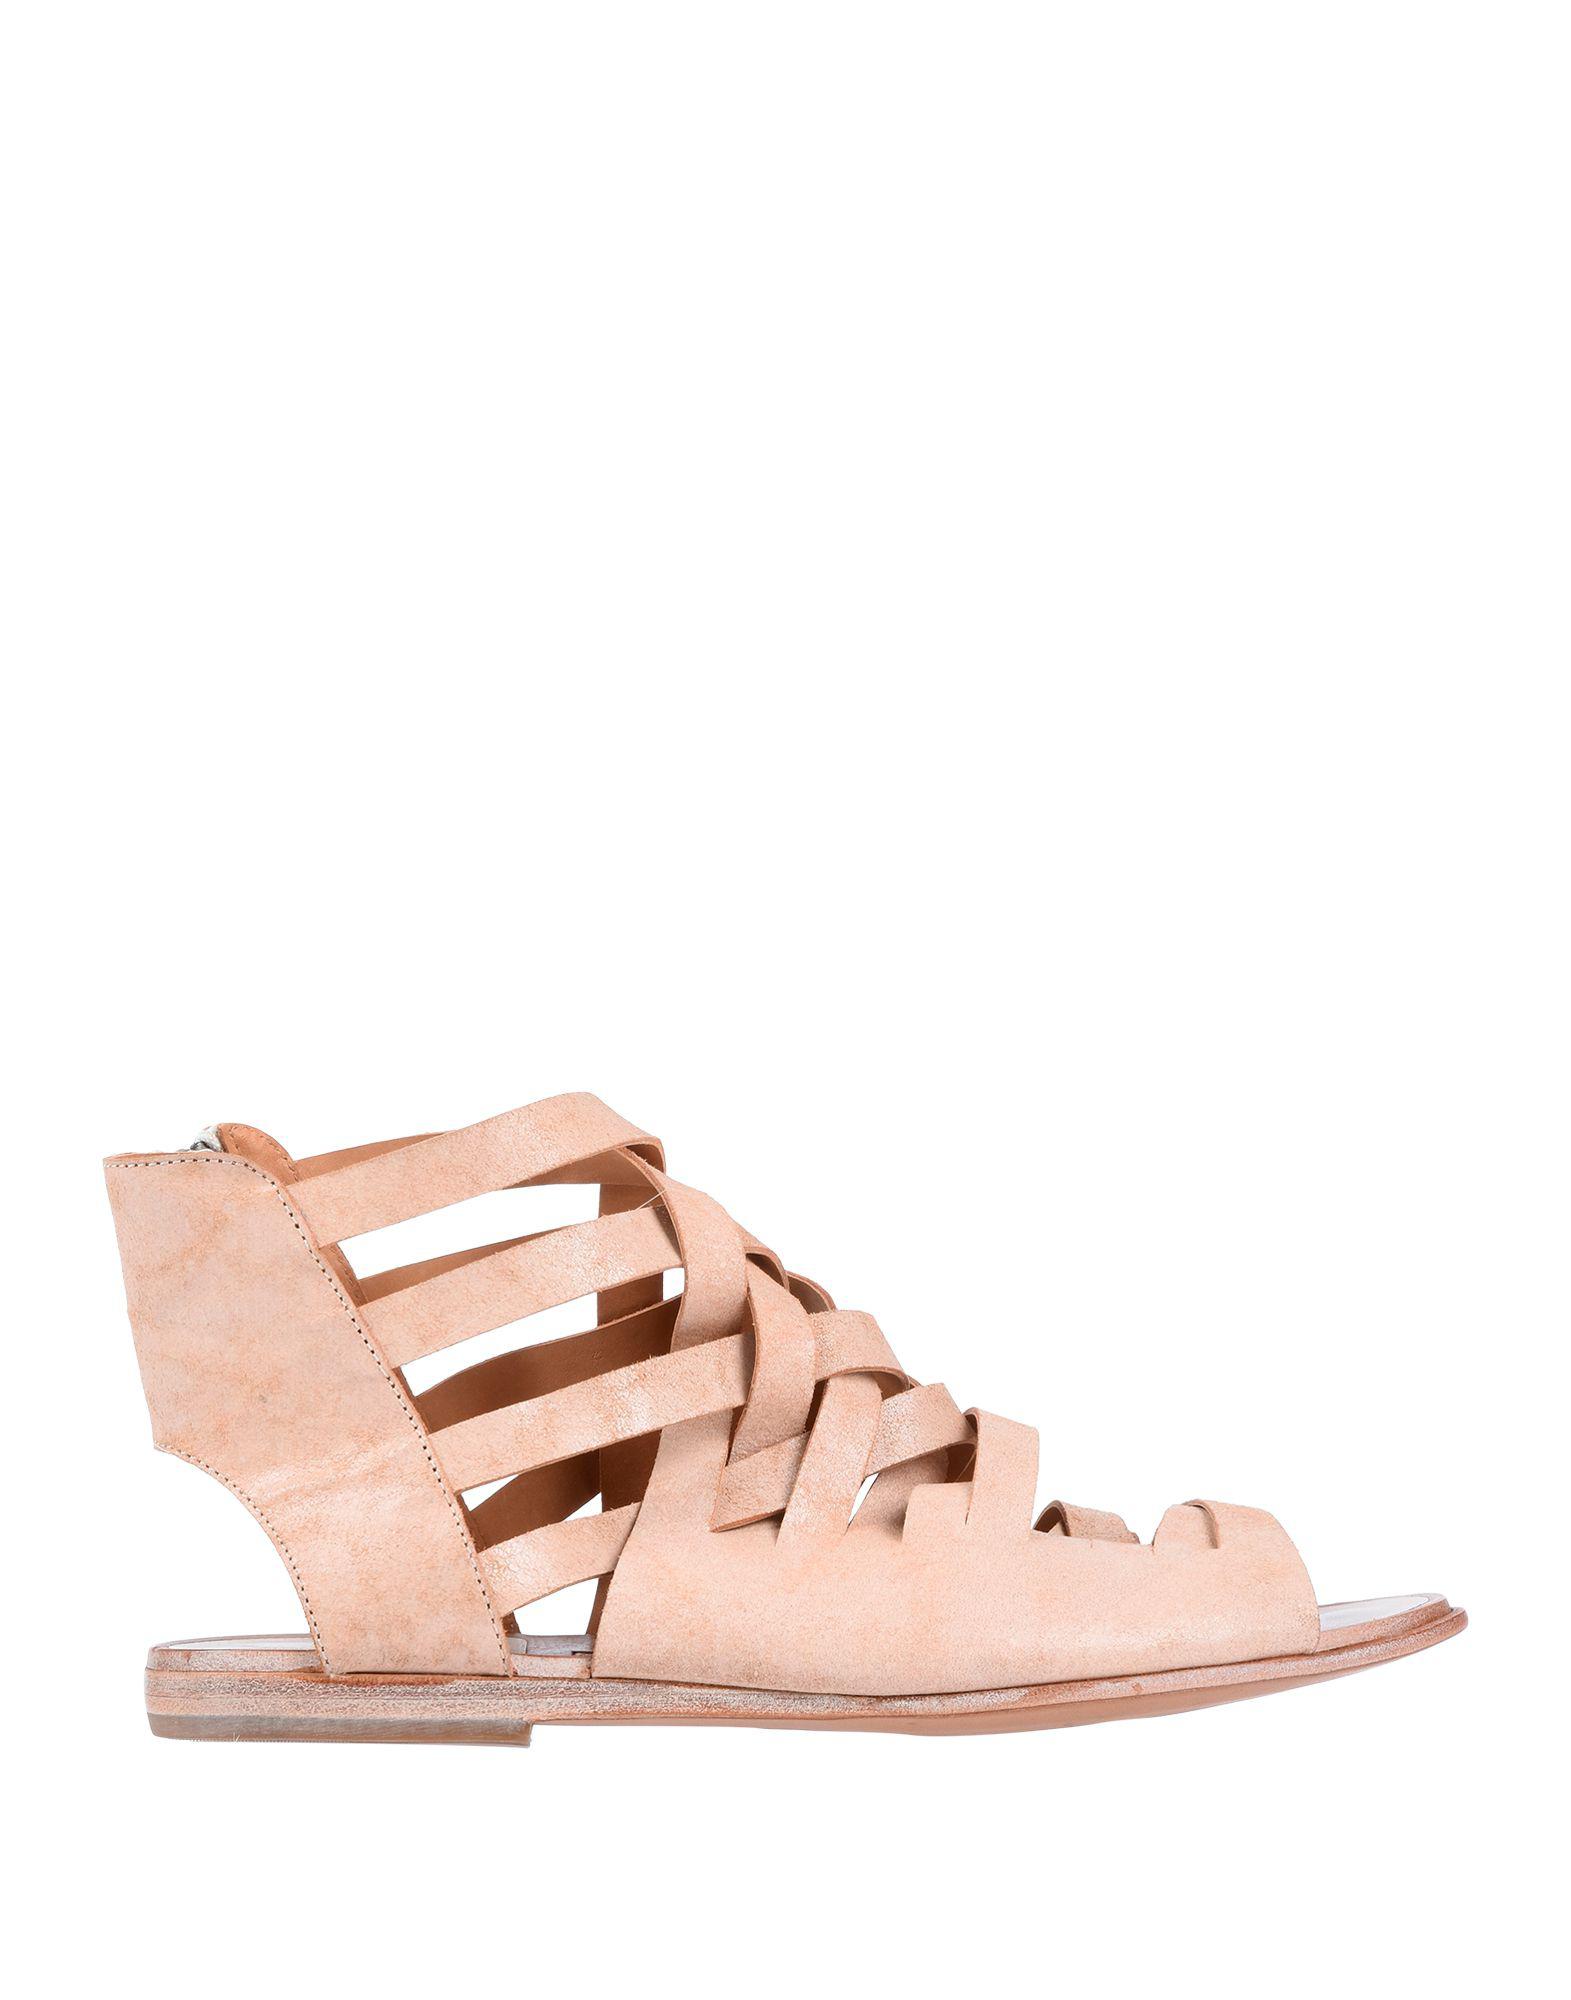 aea2077d3828 Pantanetti Sandals In Beige. yoox.com